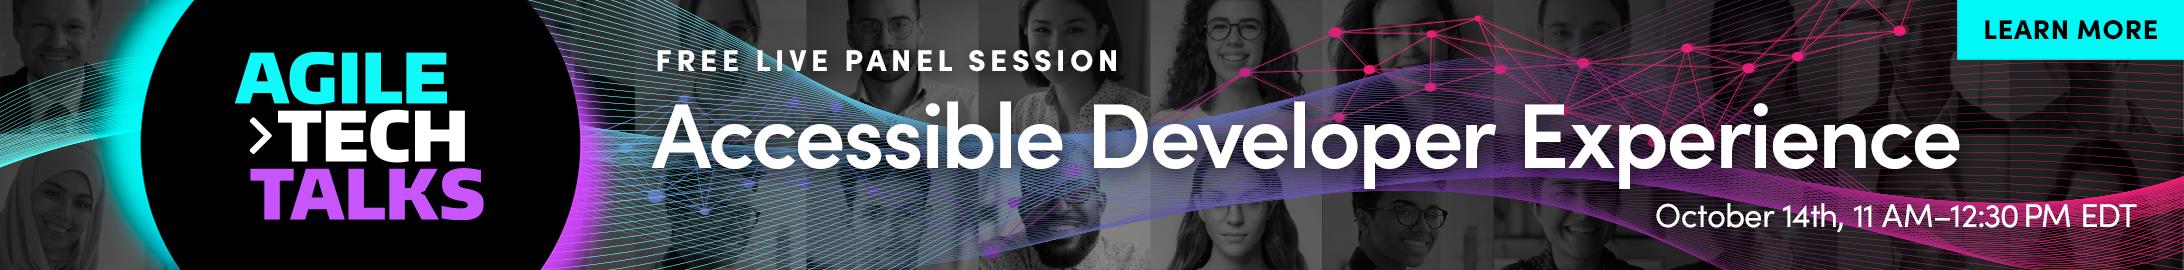 agile tech talks – Accessible Developer Experience